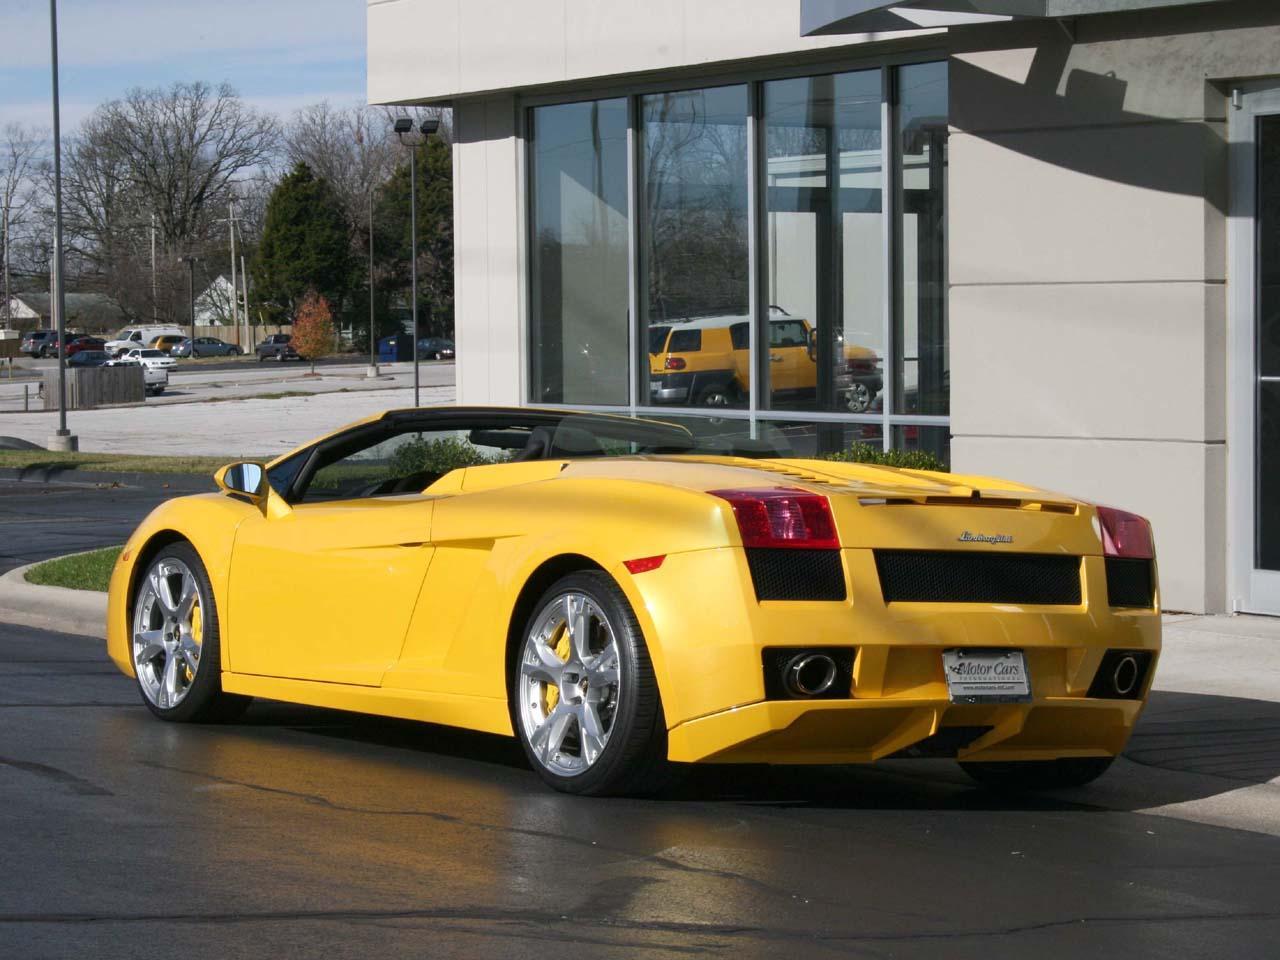 2007 Lamborghini Gallardo Spyder - Silver Arrow Cars Ltd.   2007 Lamborghini Gallardo Spyder